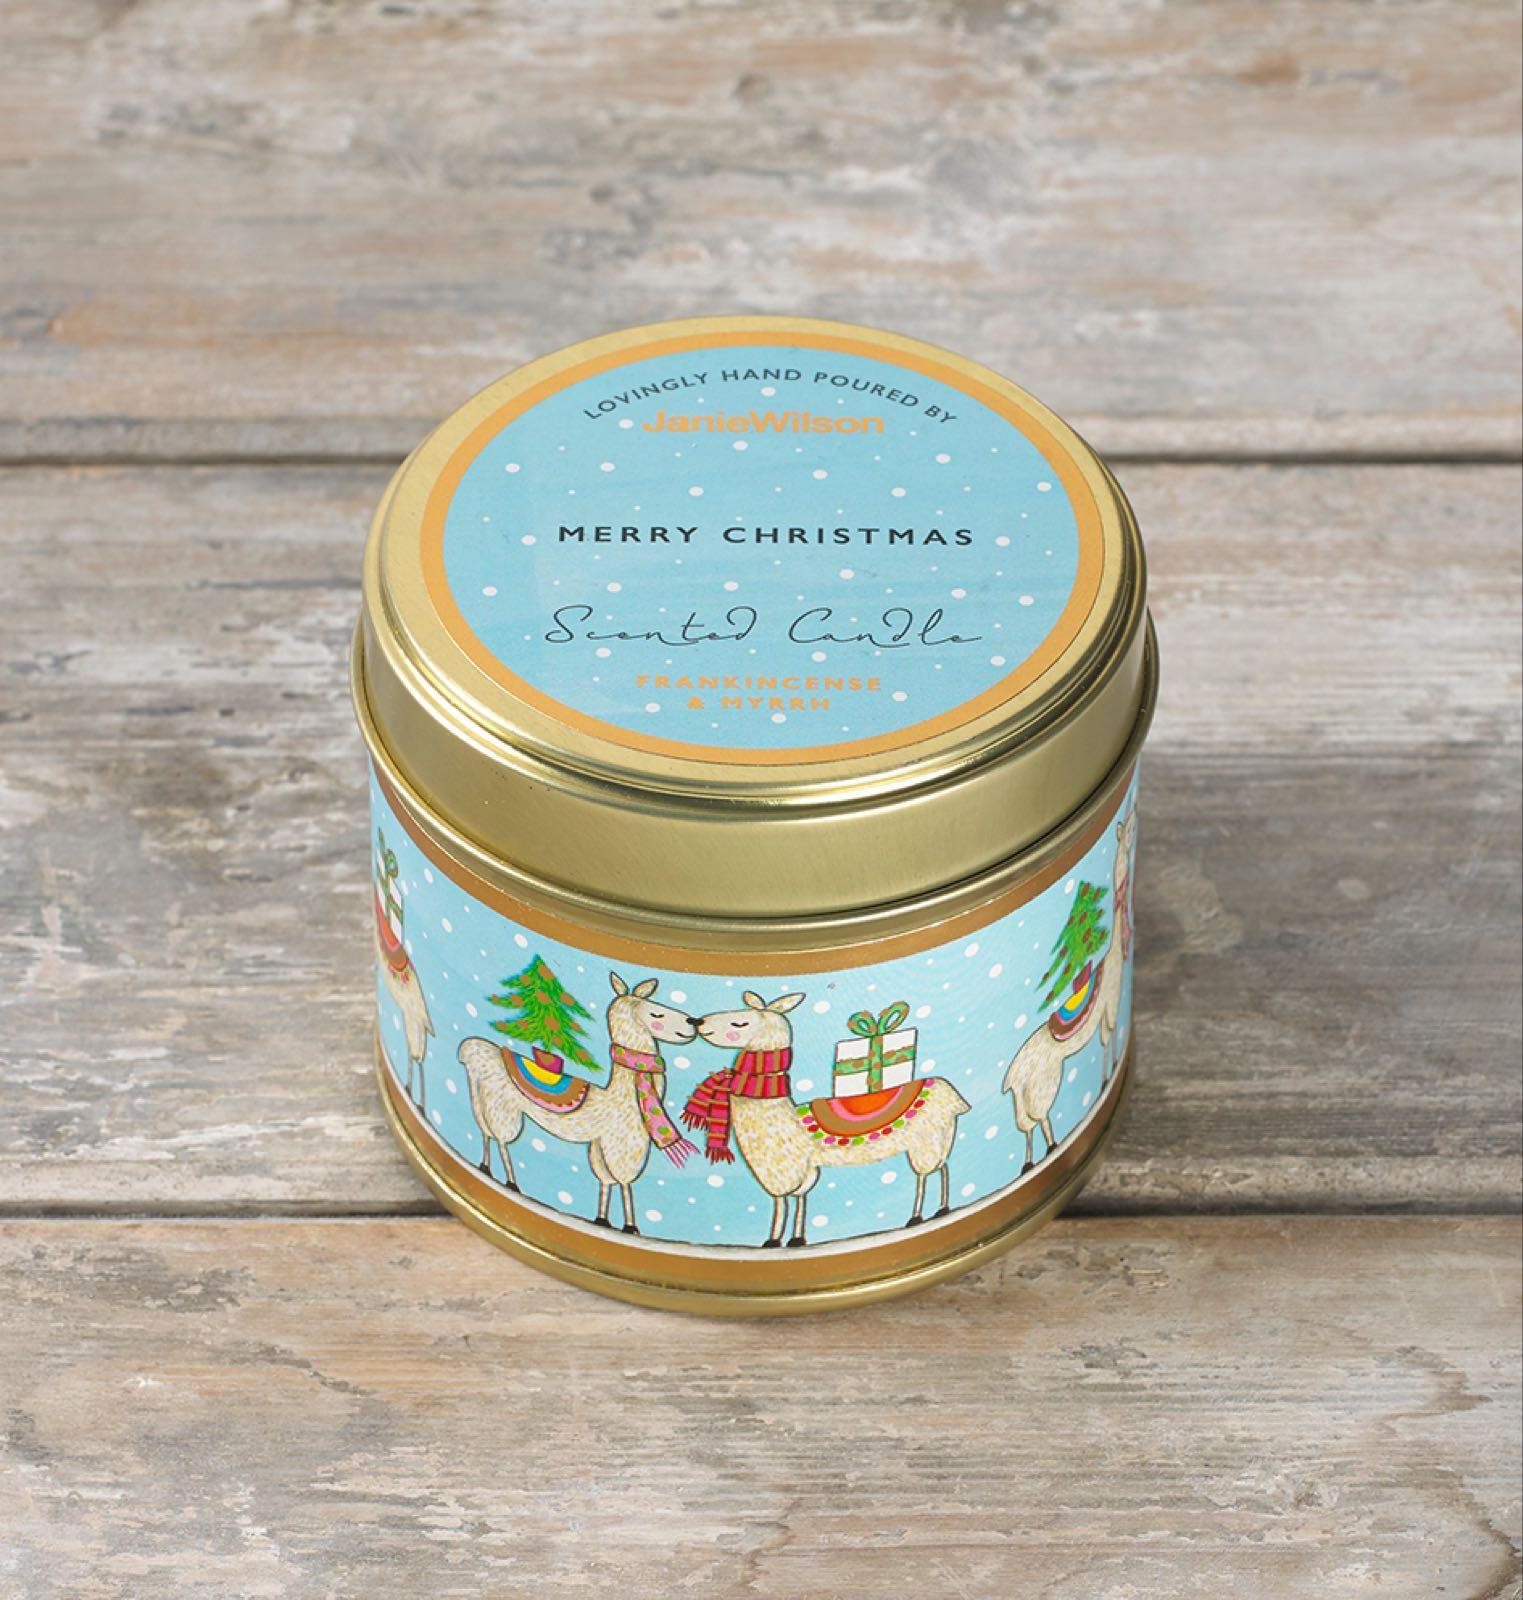 Janie wilson Merry Christmas fragranced frankincense and myrrh large tinned candle